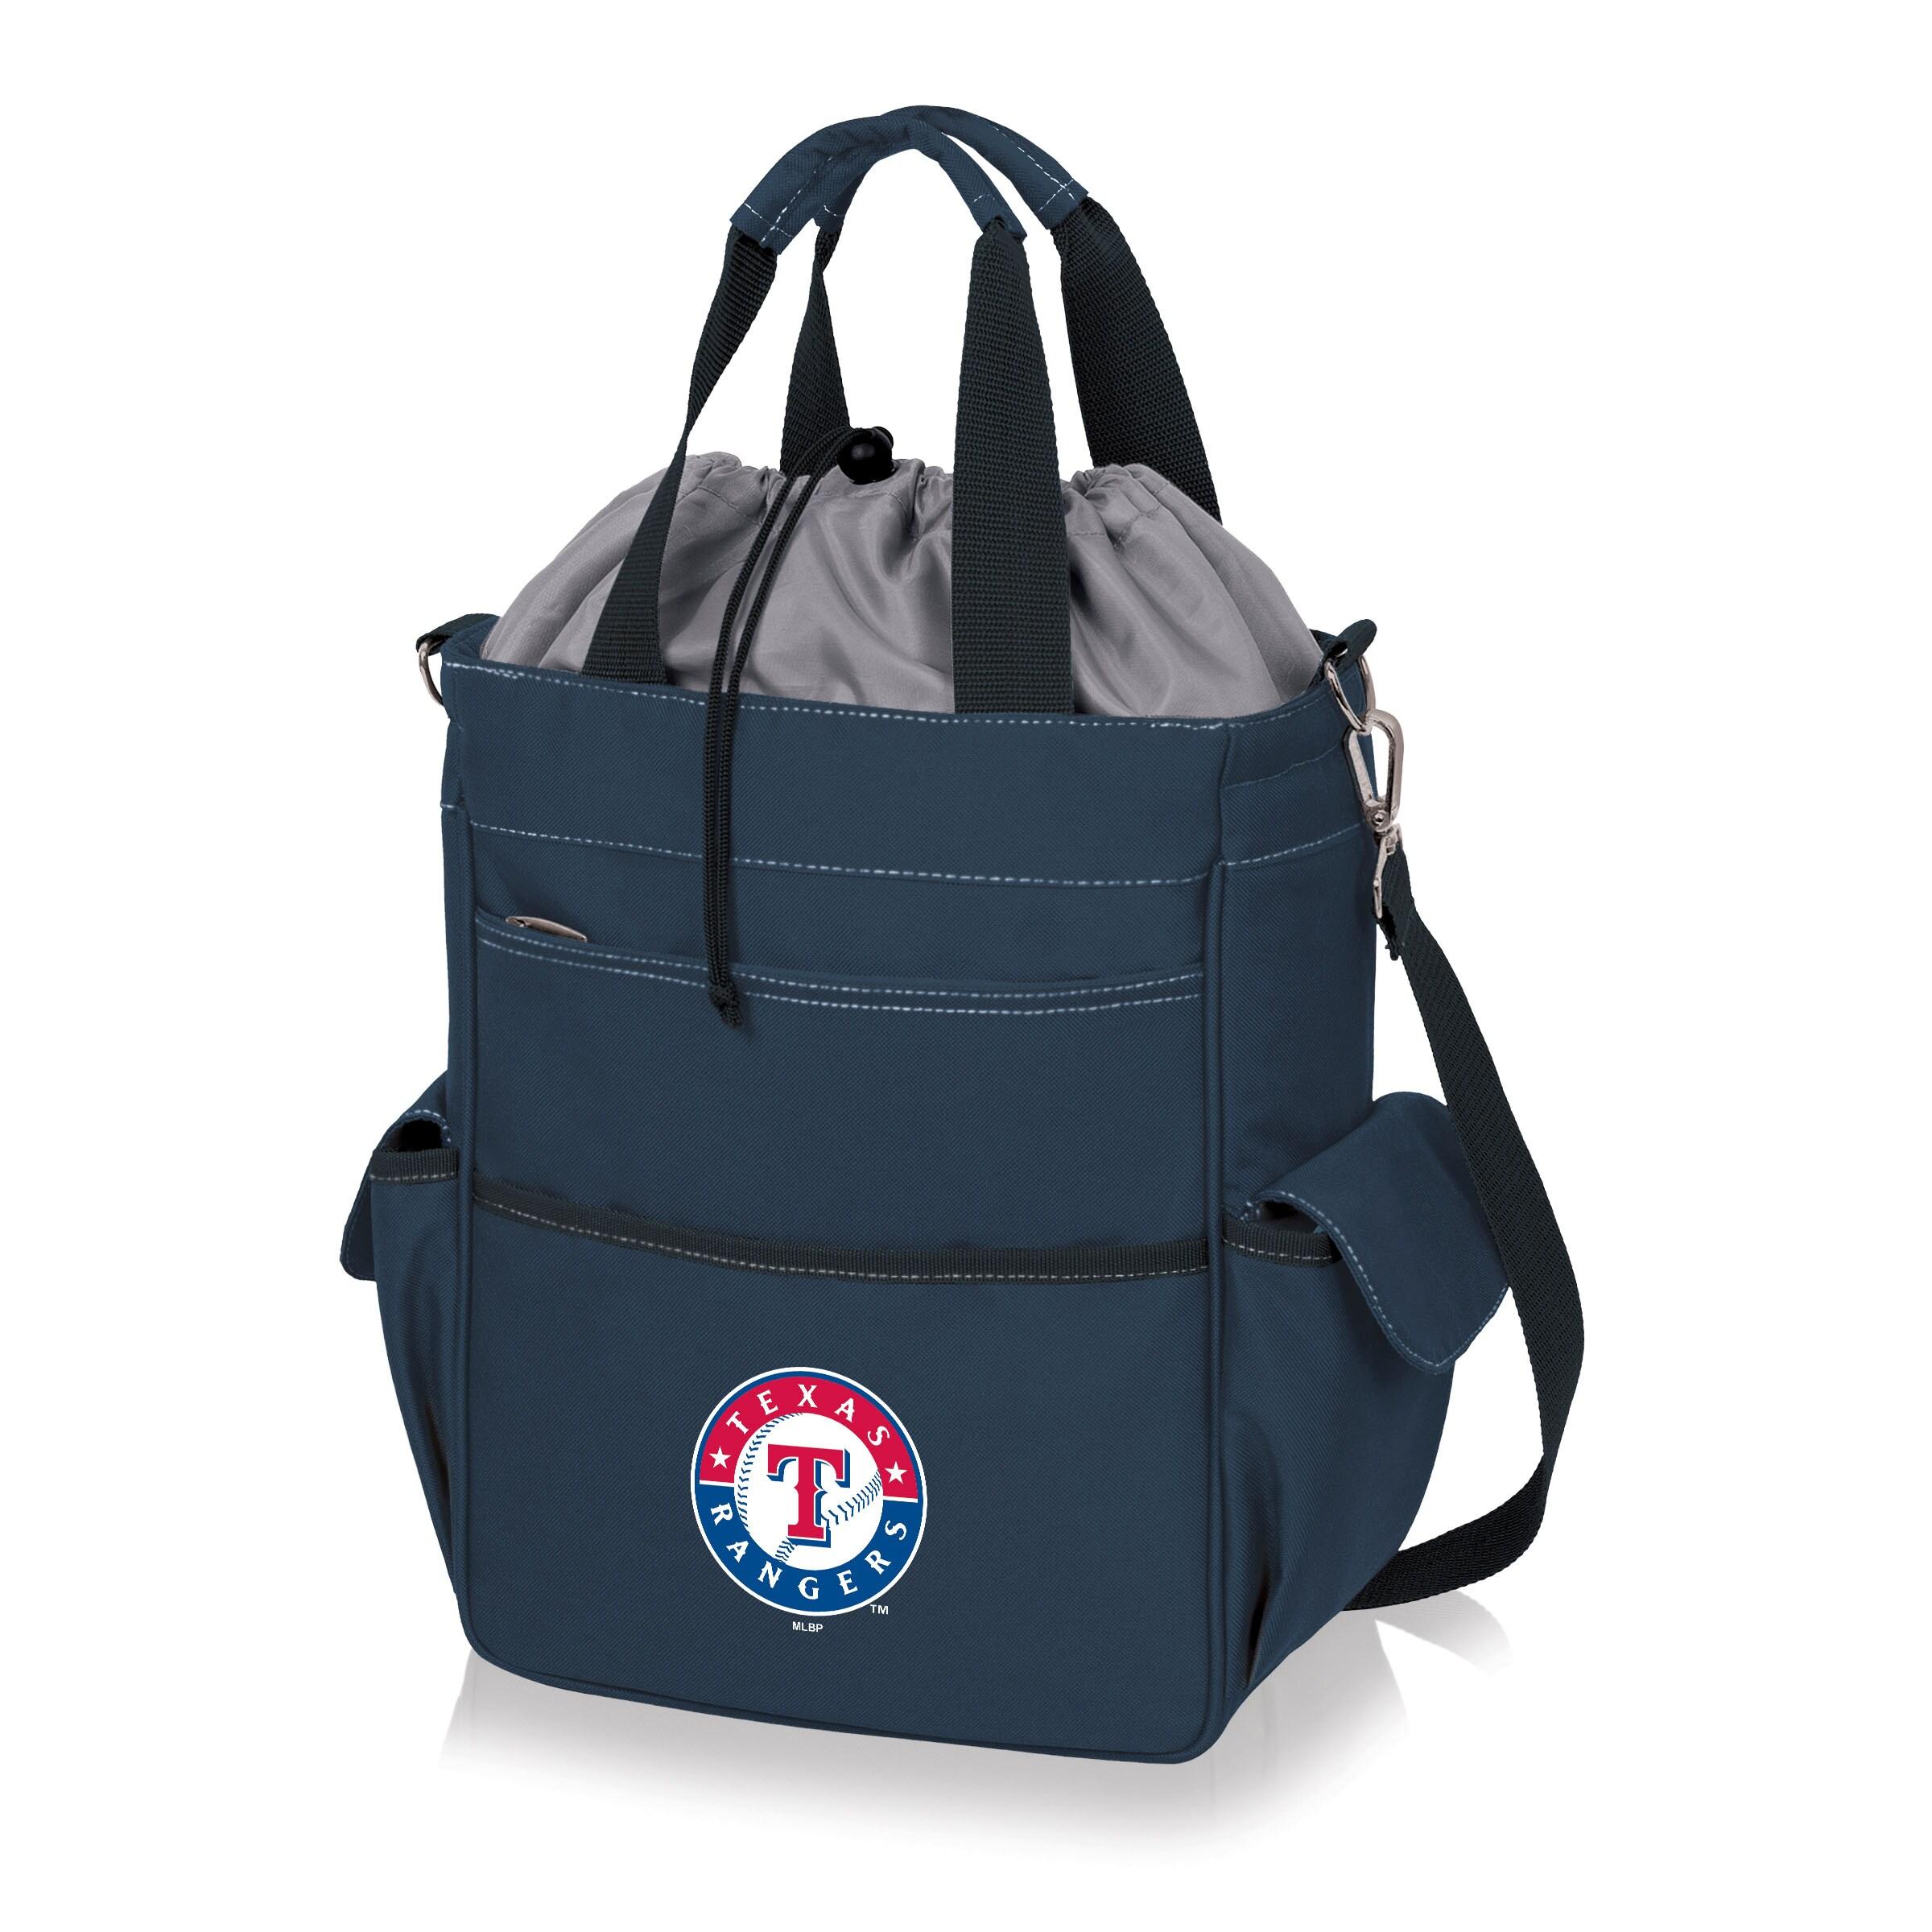 Texas Rangers Activo Cooler Tote - Navy